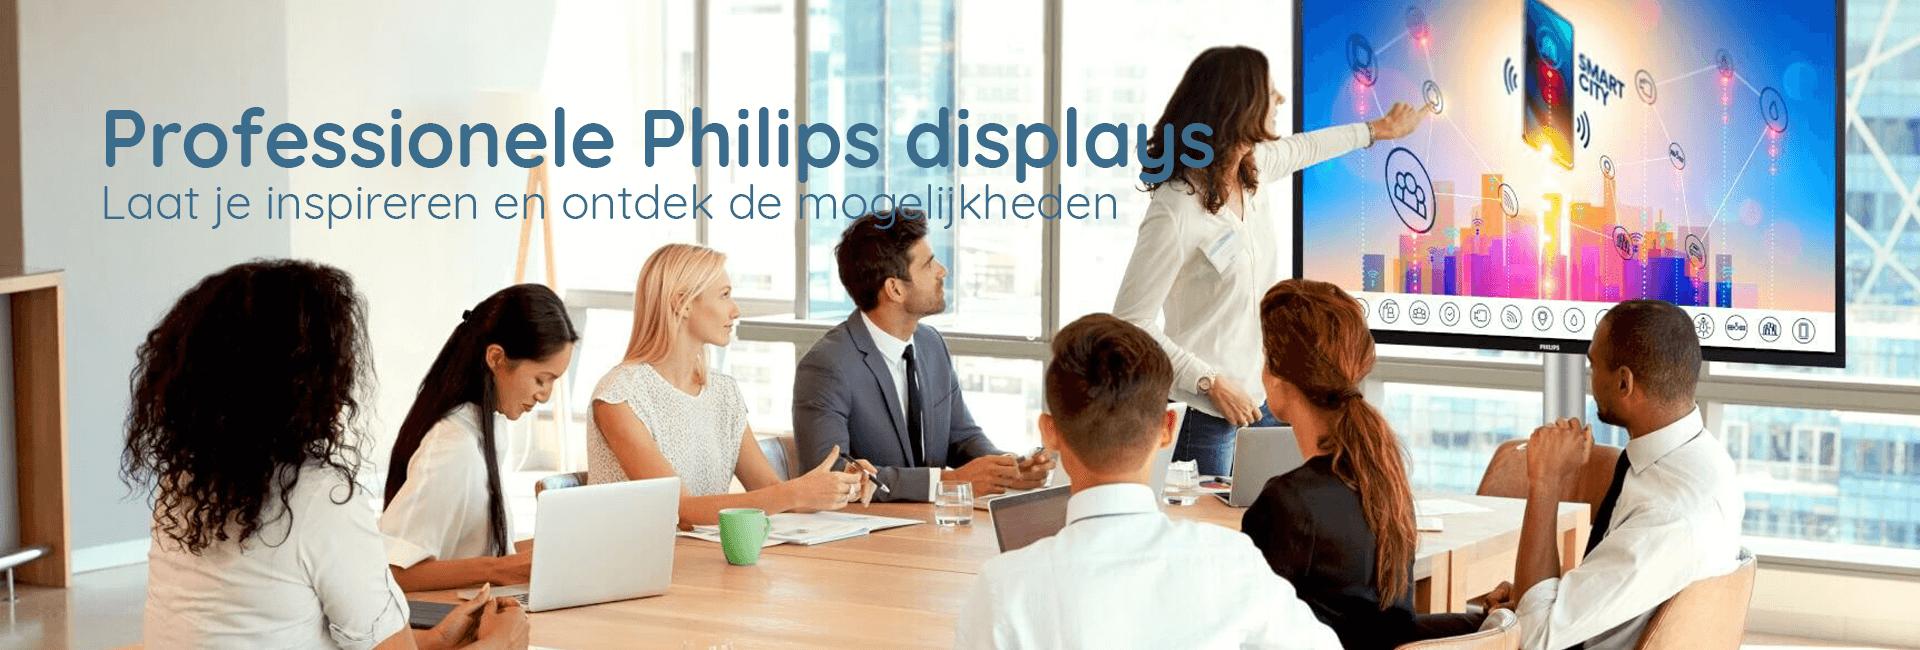 Professionele Philips displays (nieuws)